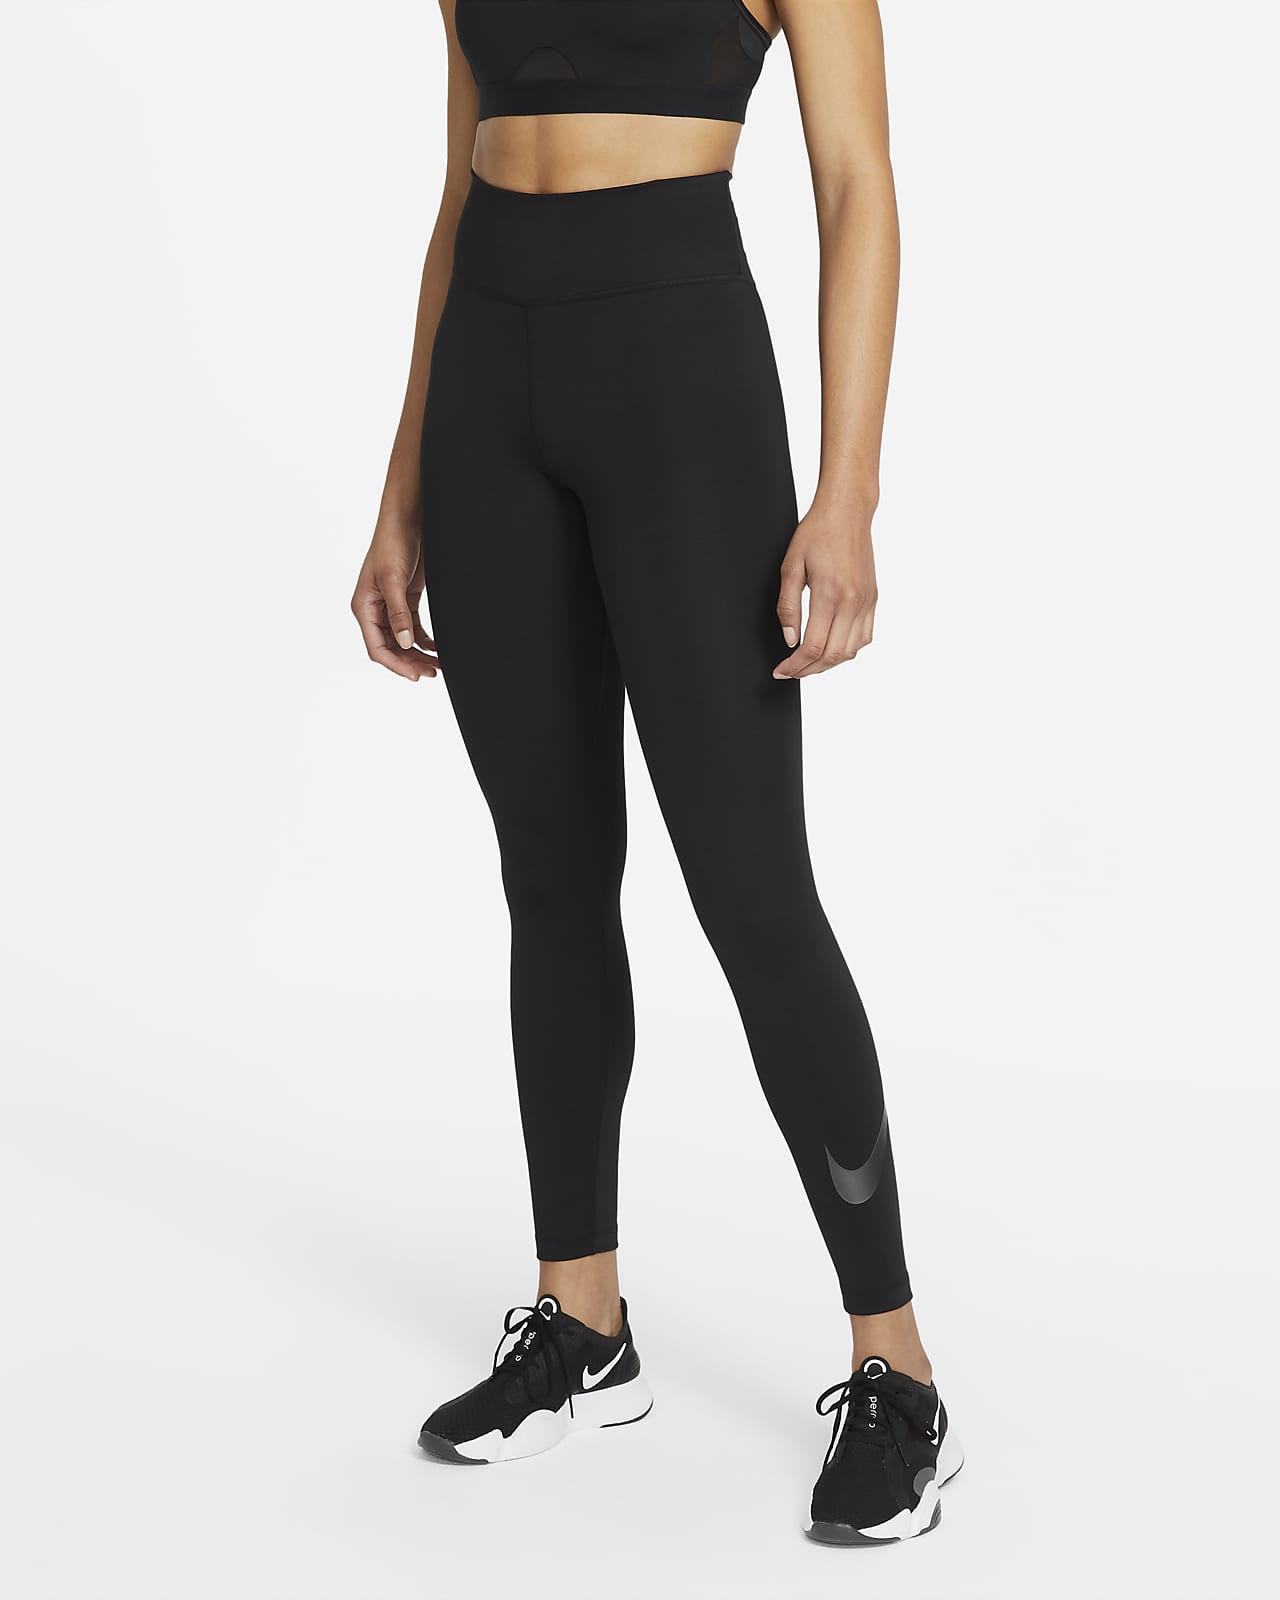 Nike One Icon Clash középmagas derekú, 7/8-os, mintás női leggings